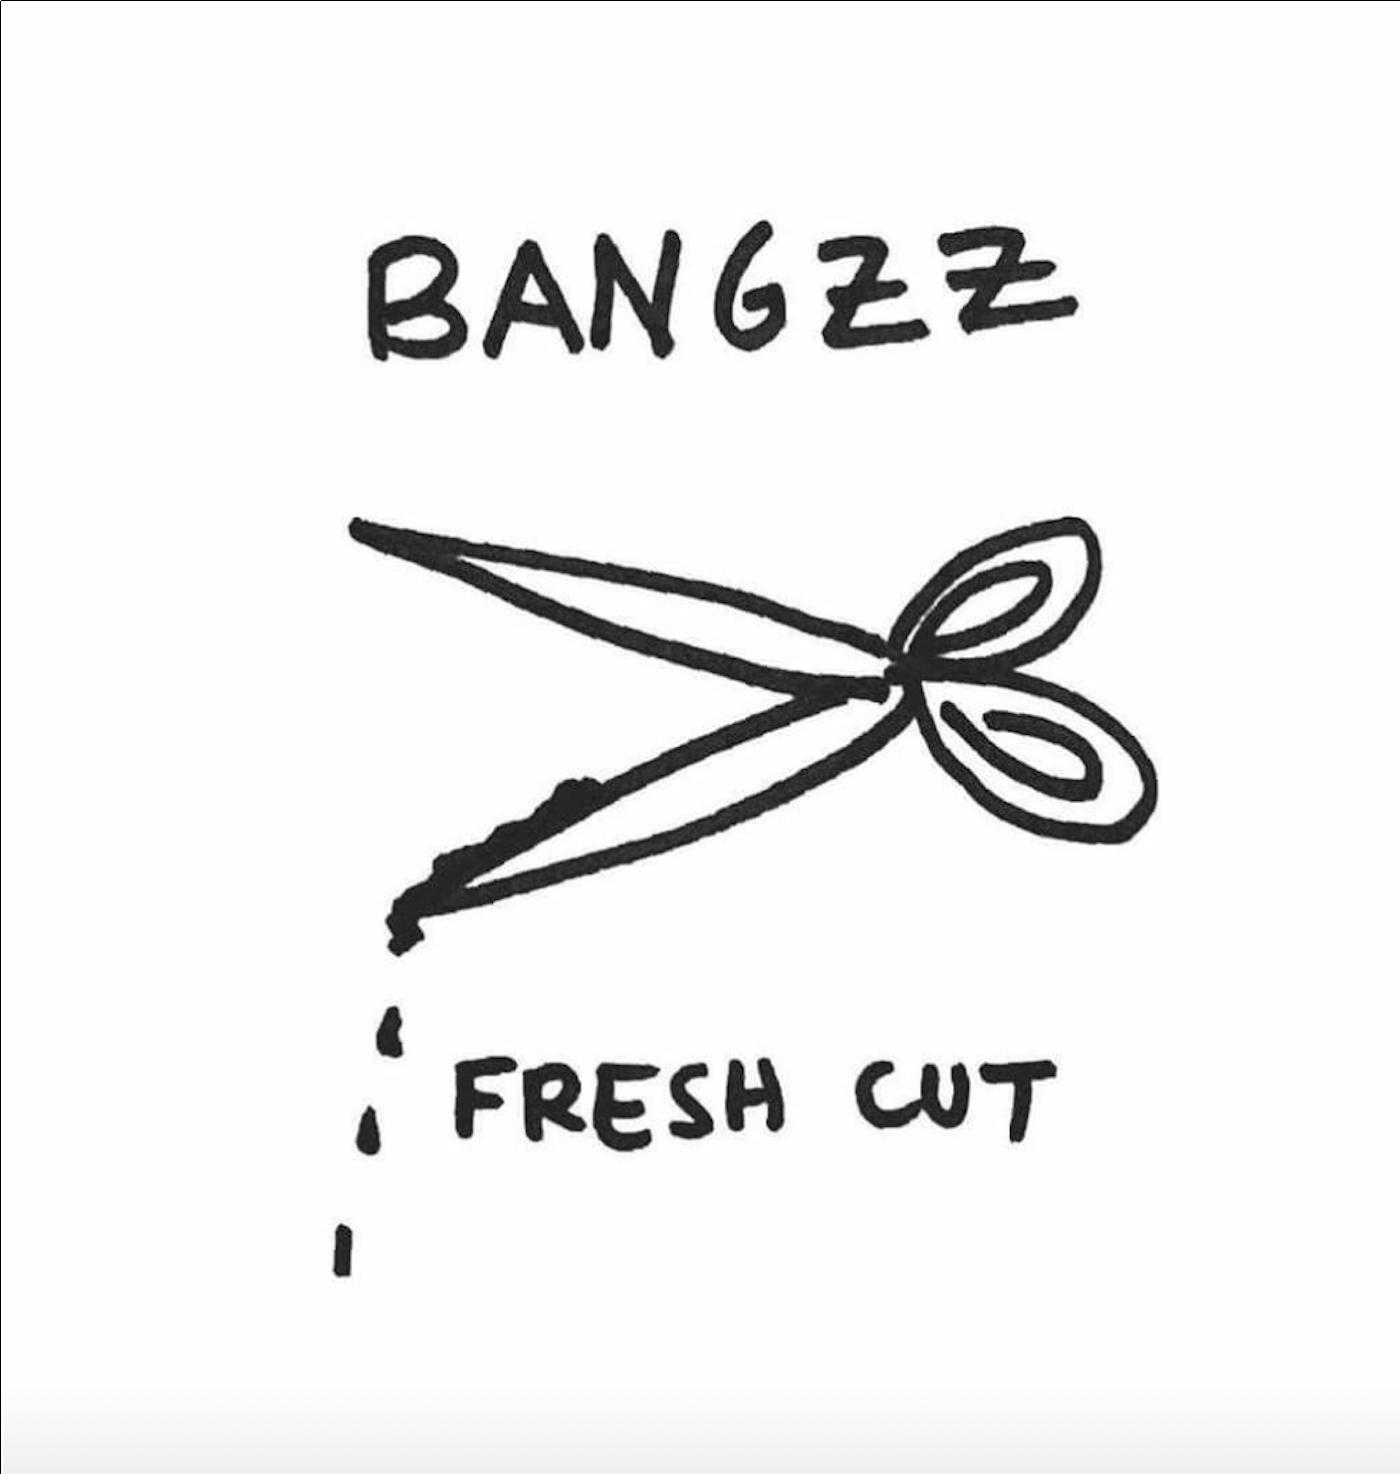 Bangzz_FreshCut.png